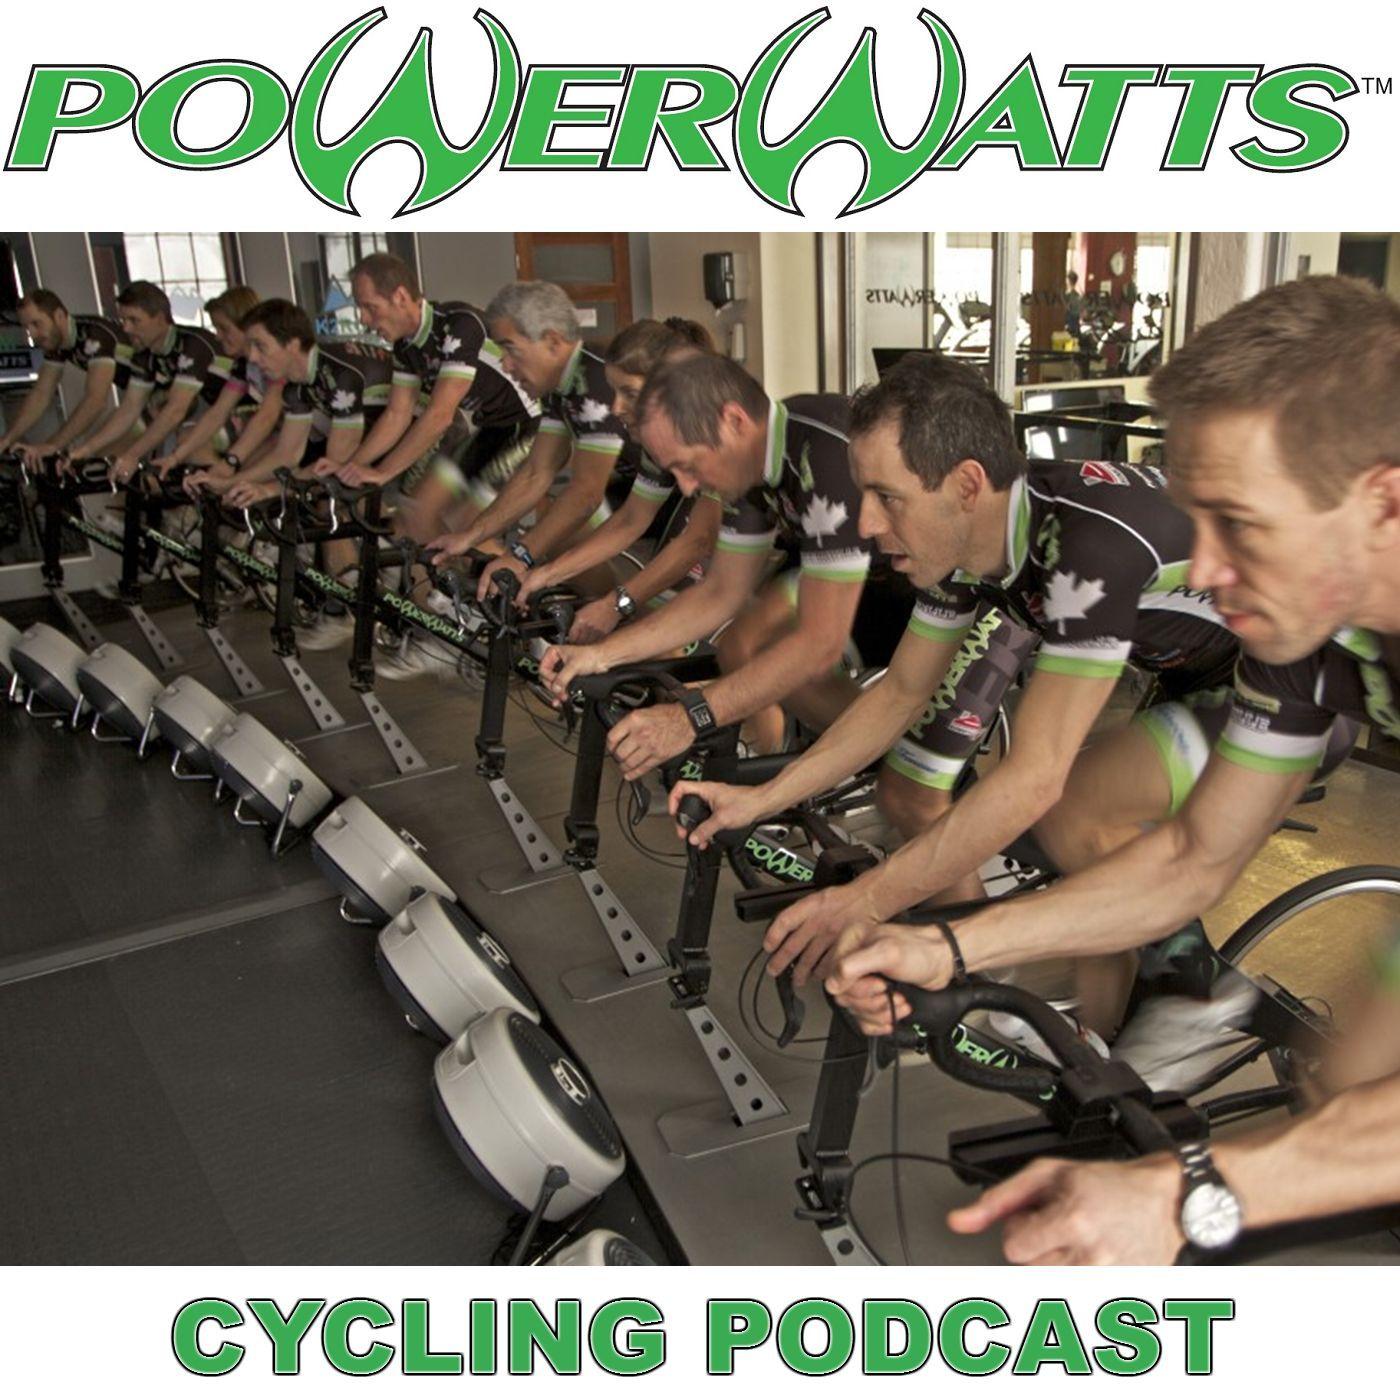 Episode 2. PowerWatts Podcast Q&A